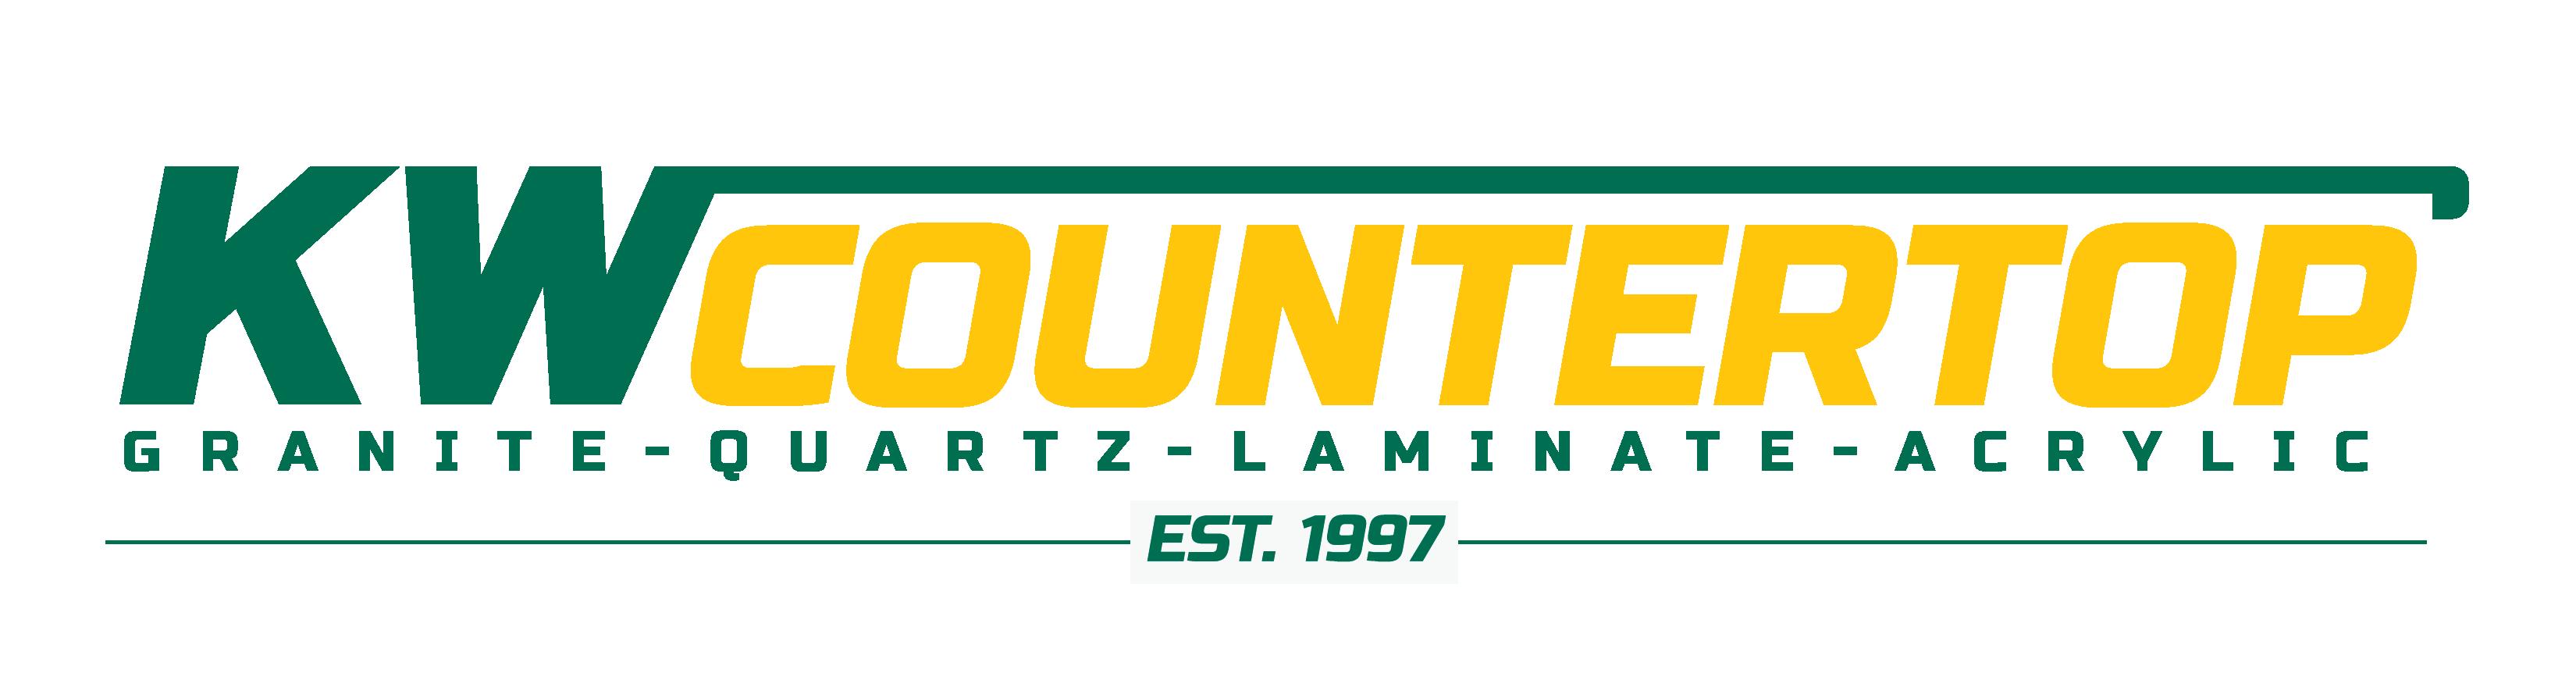 KW Countertop logo